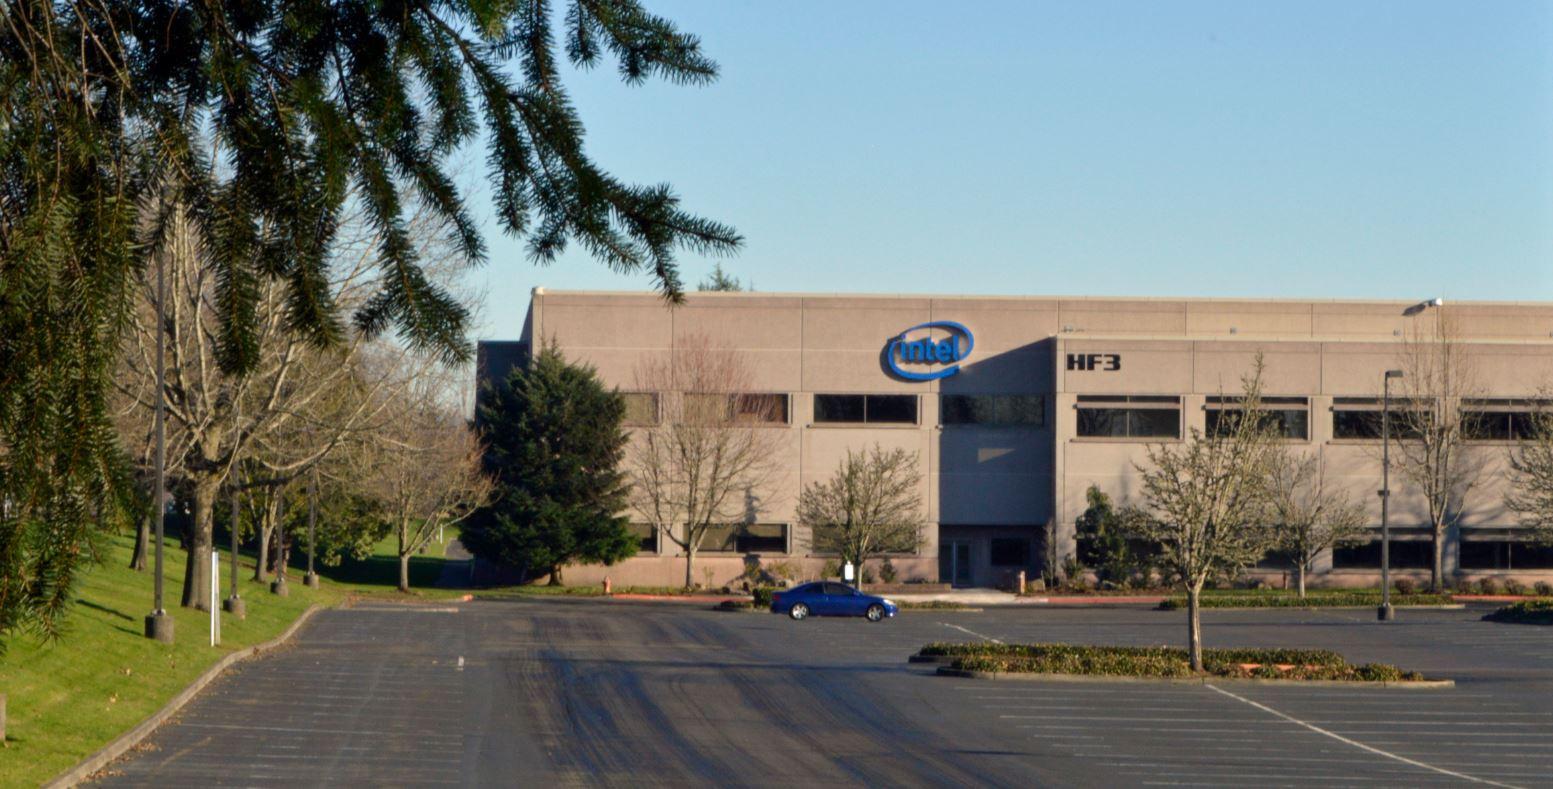 8-intel-corporation-high-tech-corridor-hillsboro-oregon-the-kelly-group-real-estate